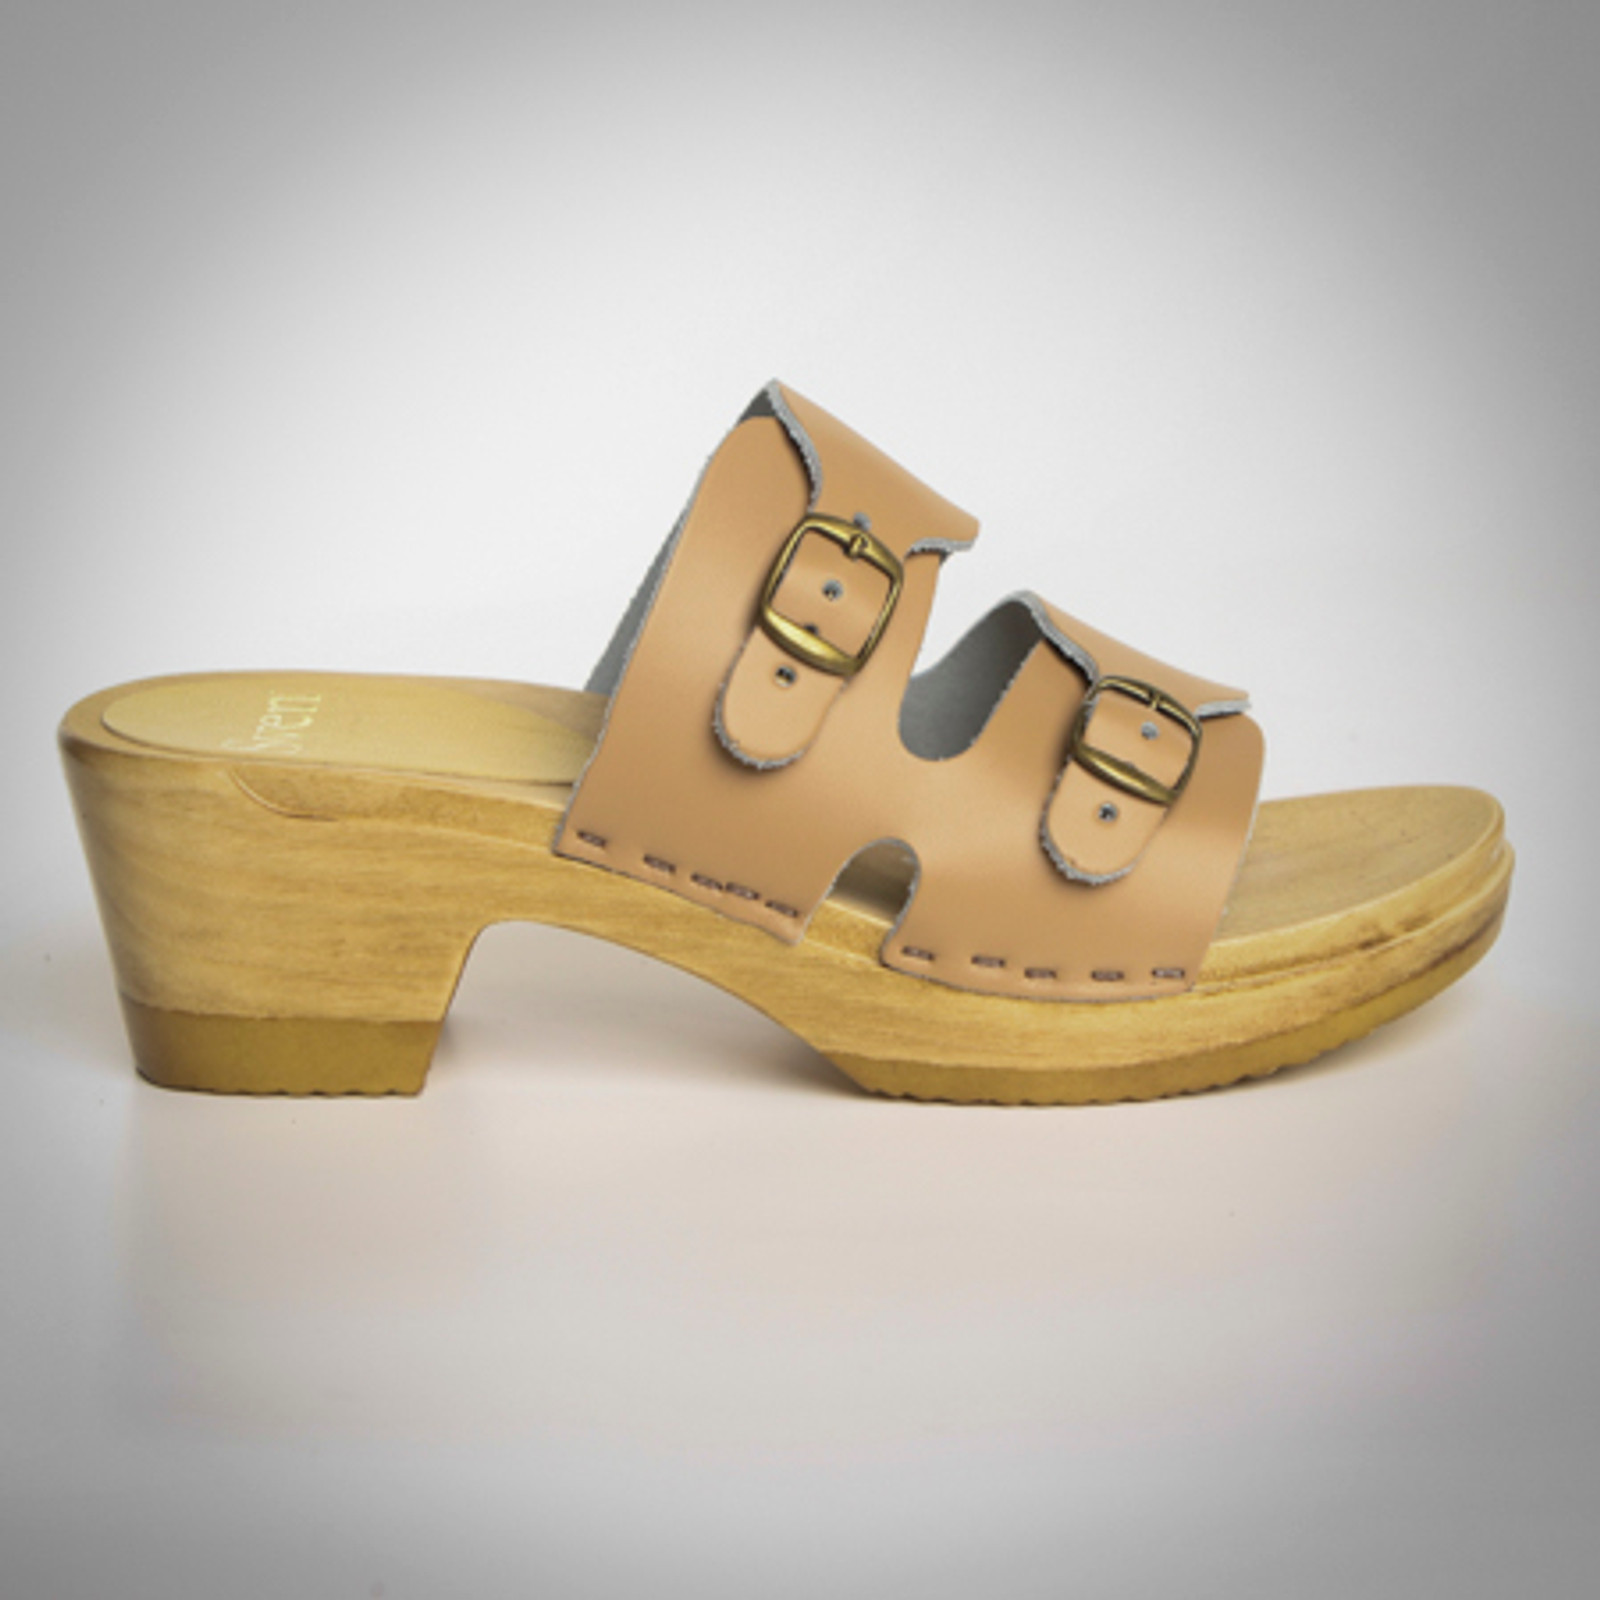 2 Strap Buckle Clogs - Mid Heels